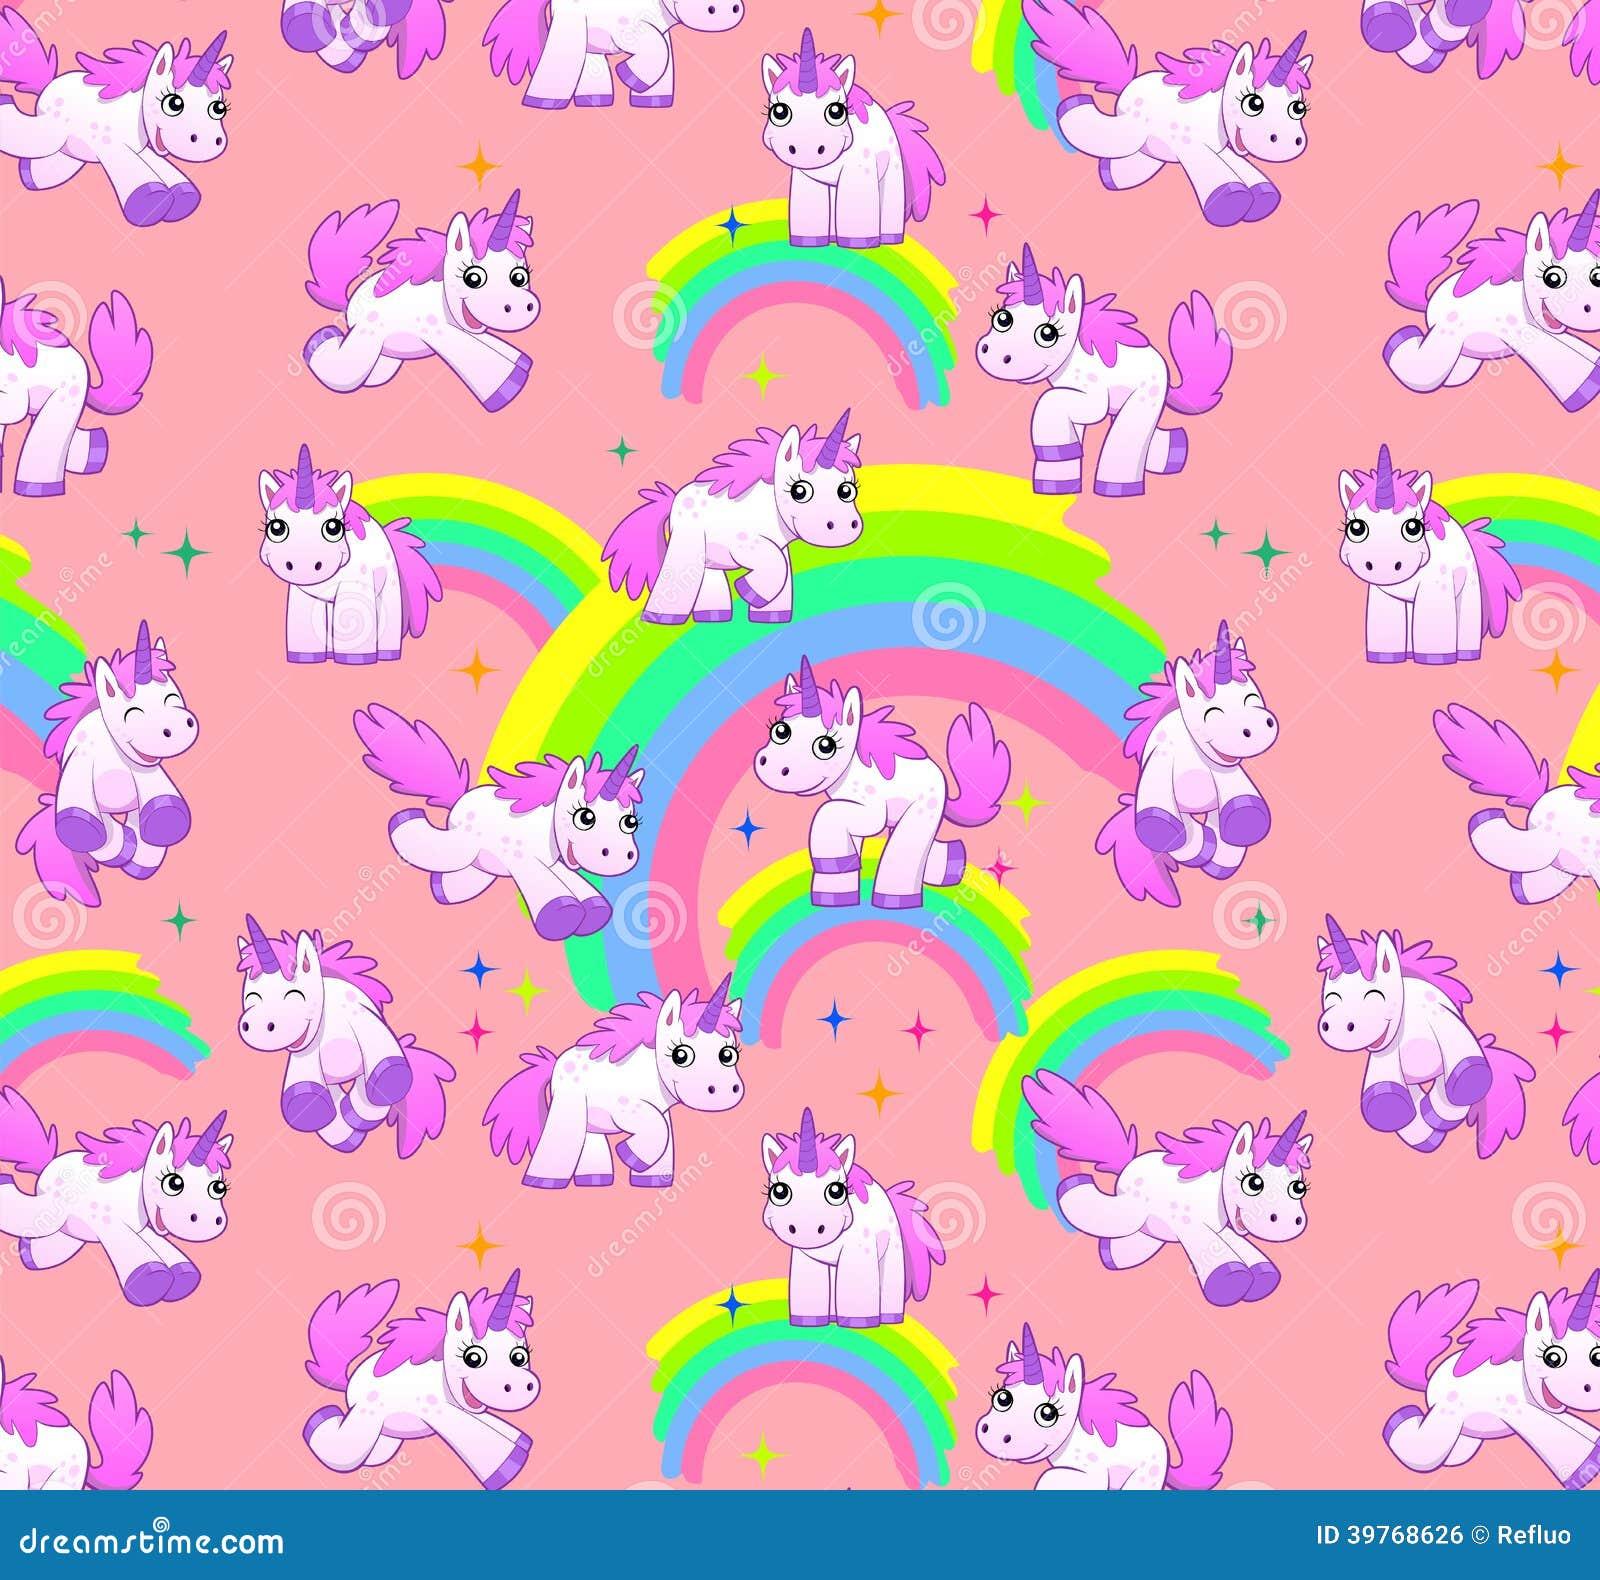 pink unicorns wallpaper